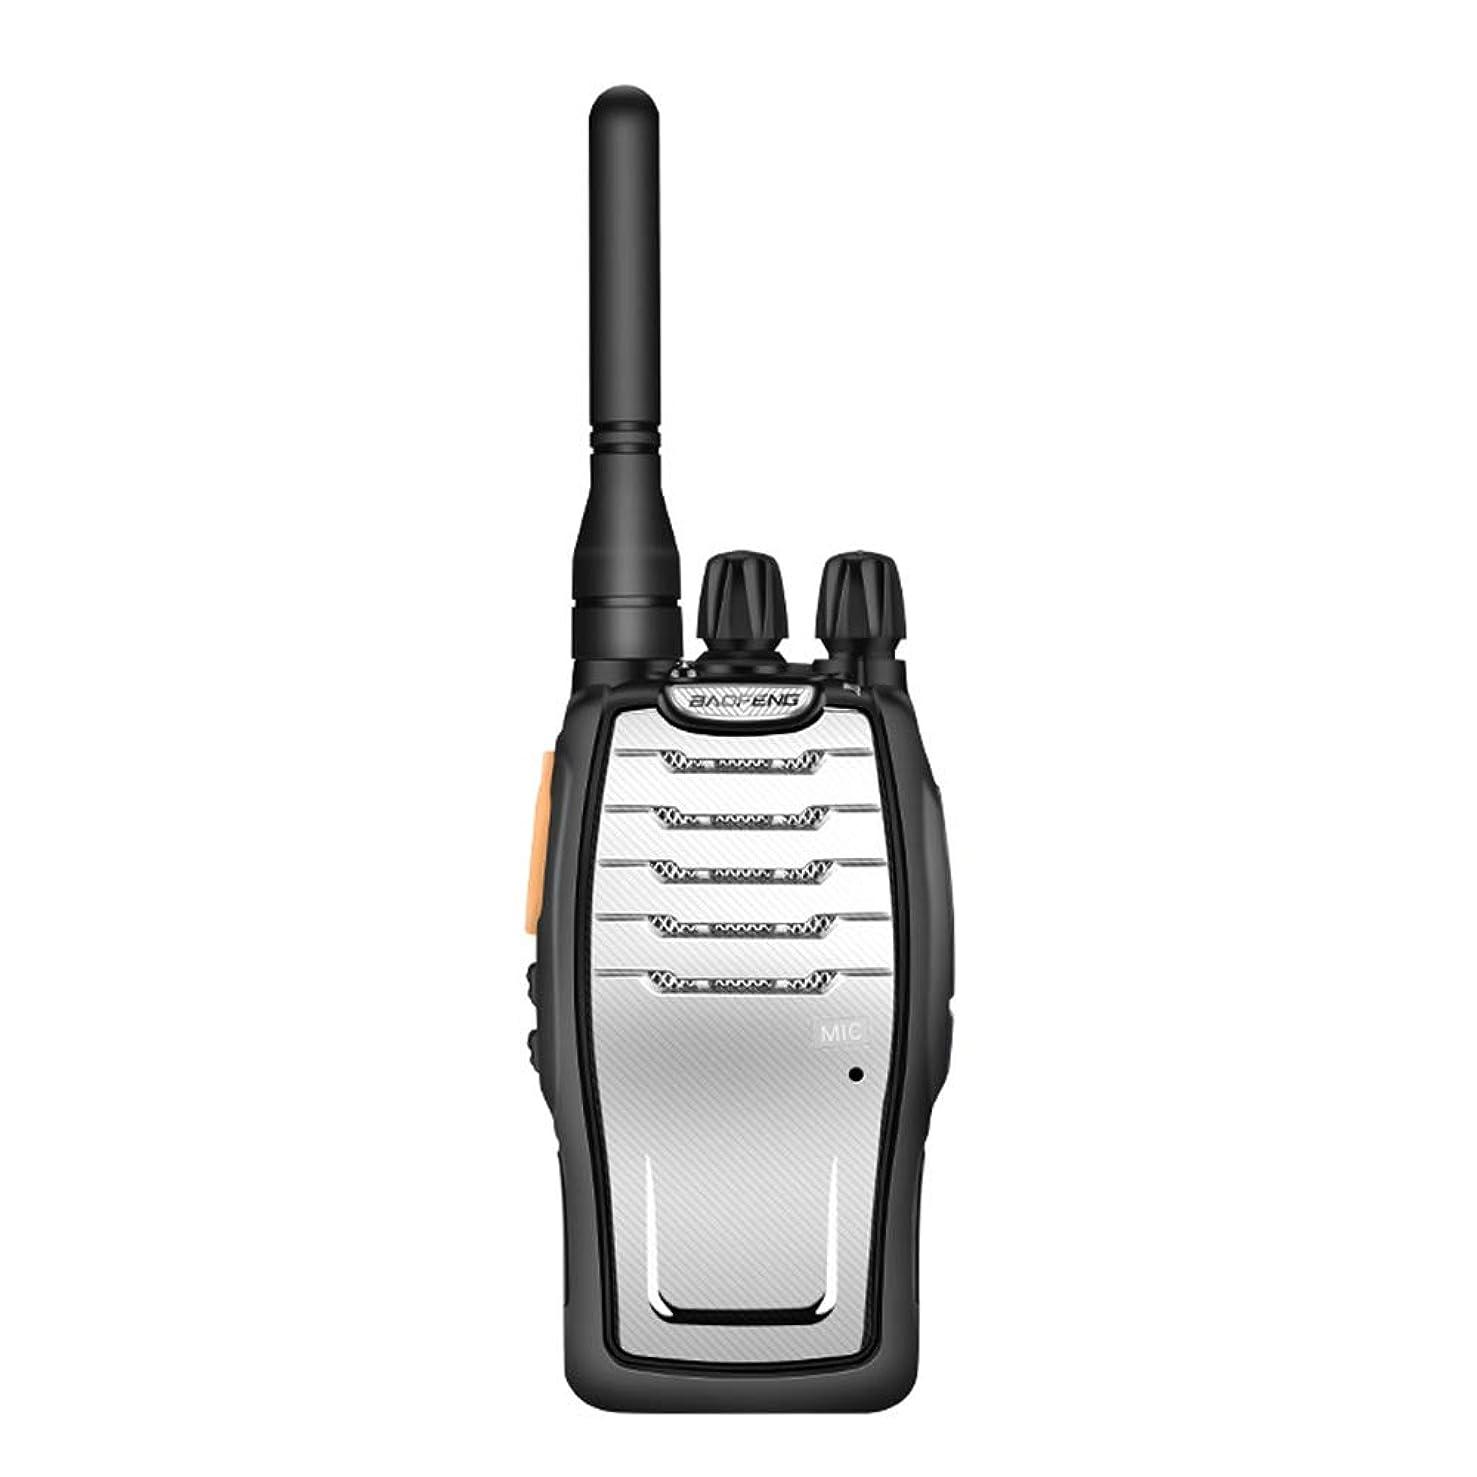 DJG Rechargeable Remote Two-Way Radio Wireless Handheld Hotel Walkie-Talkie High-Power Hand-held Walkie-Talkie Lithium-ion Battery(2pack)